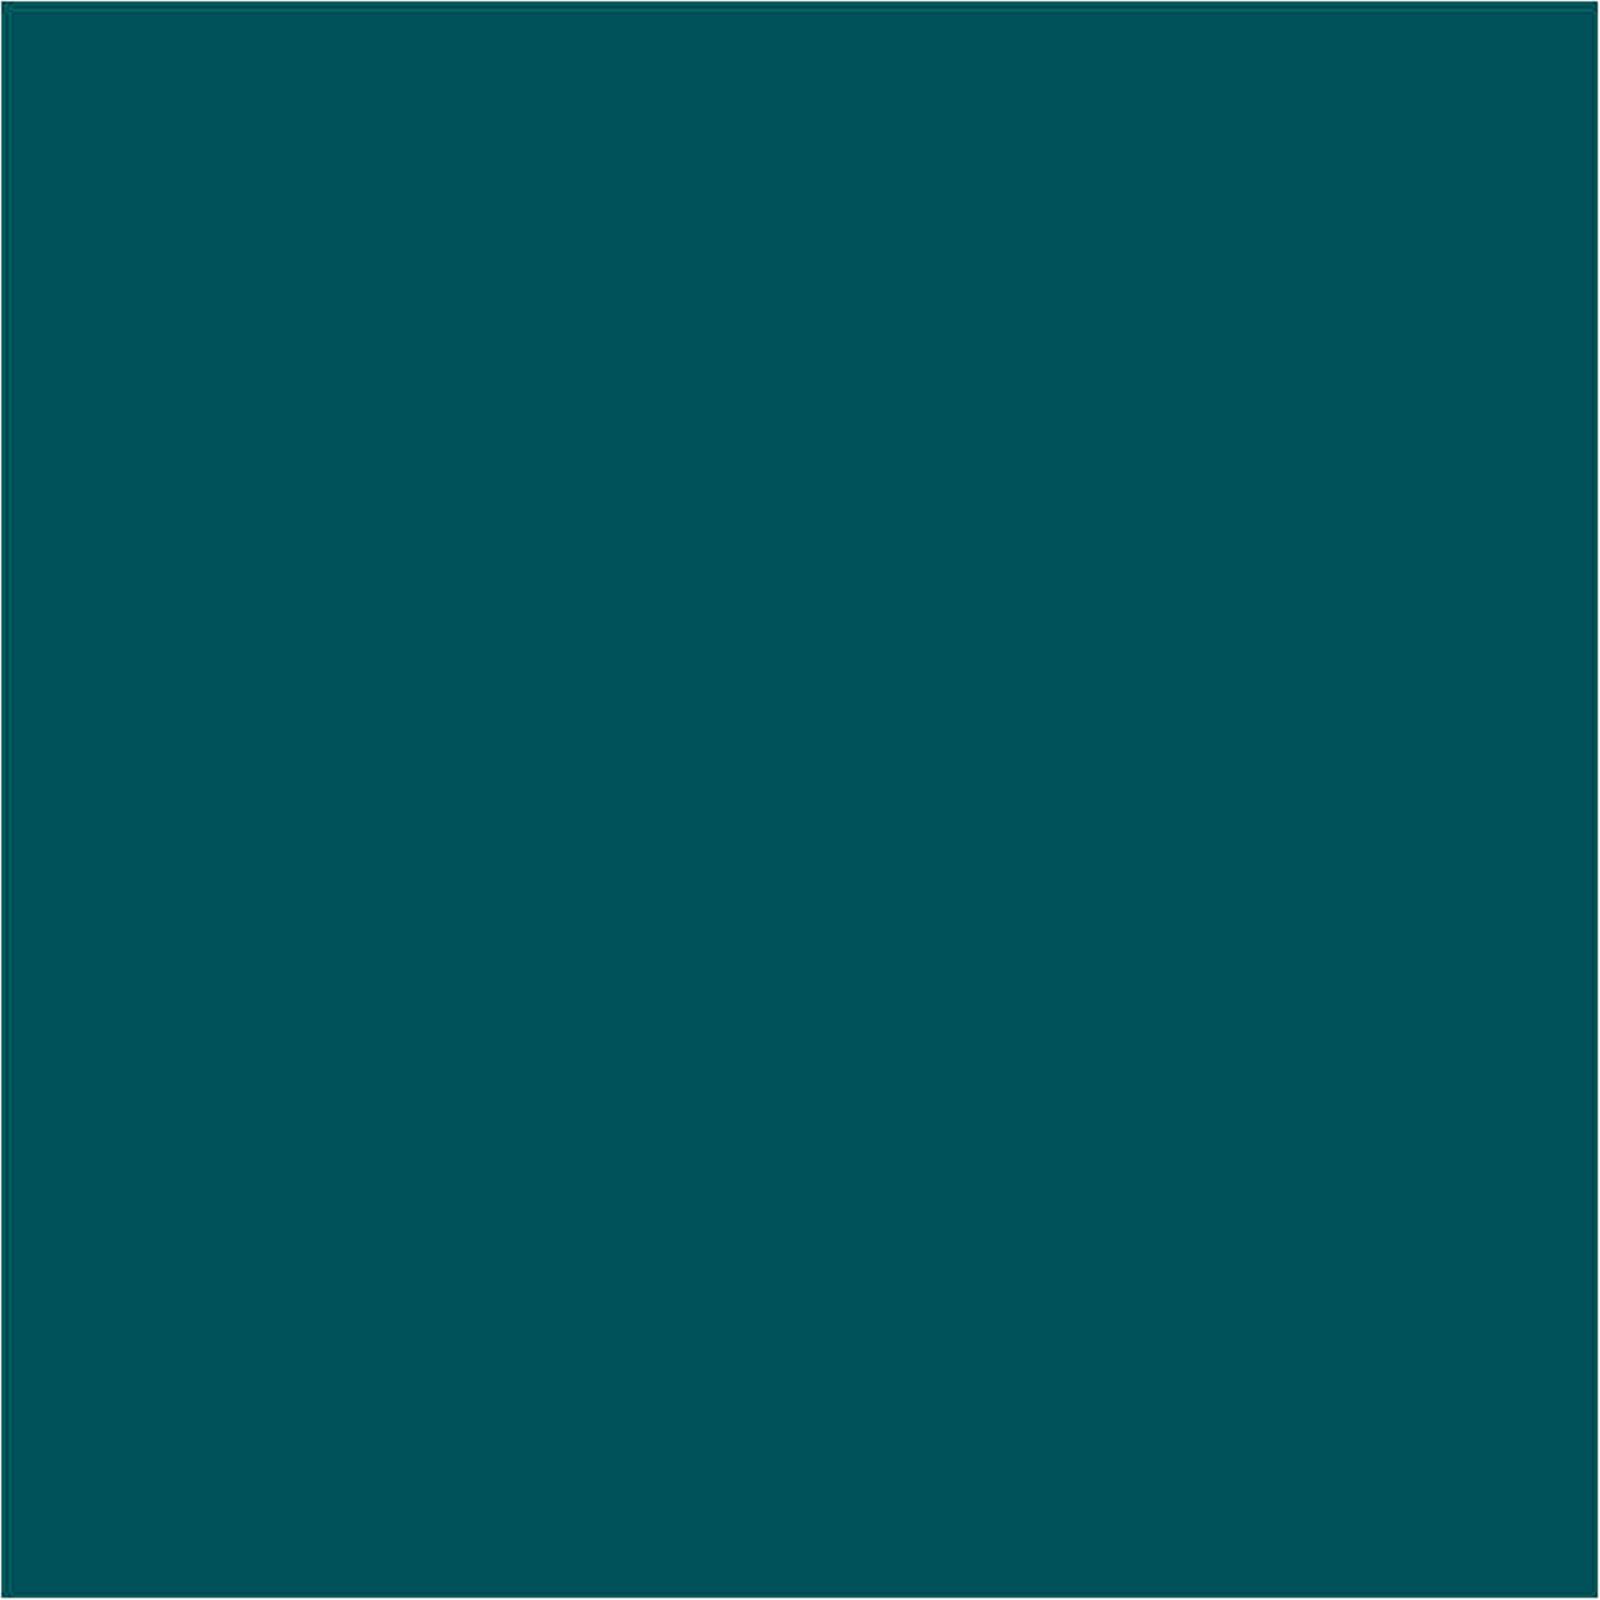 albastru turcoaz creamy